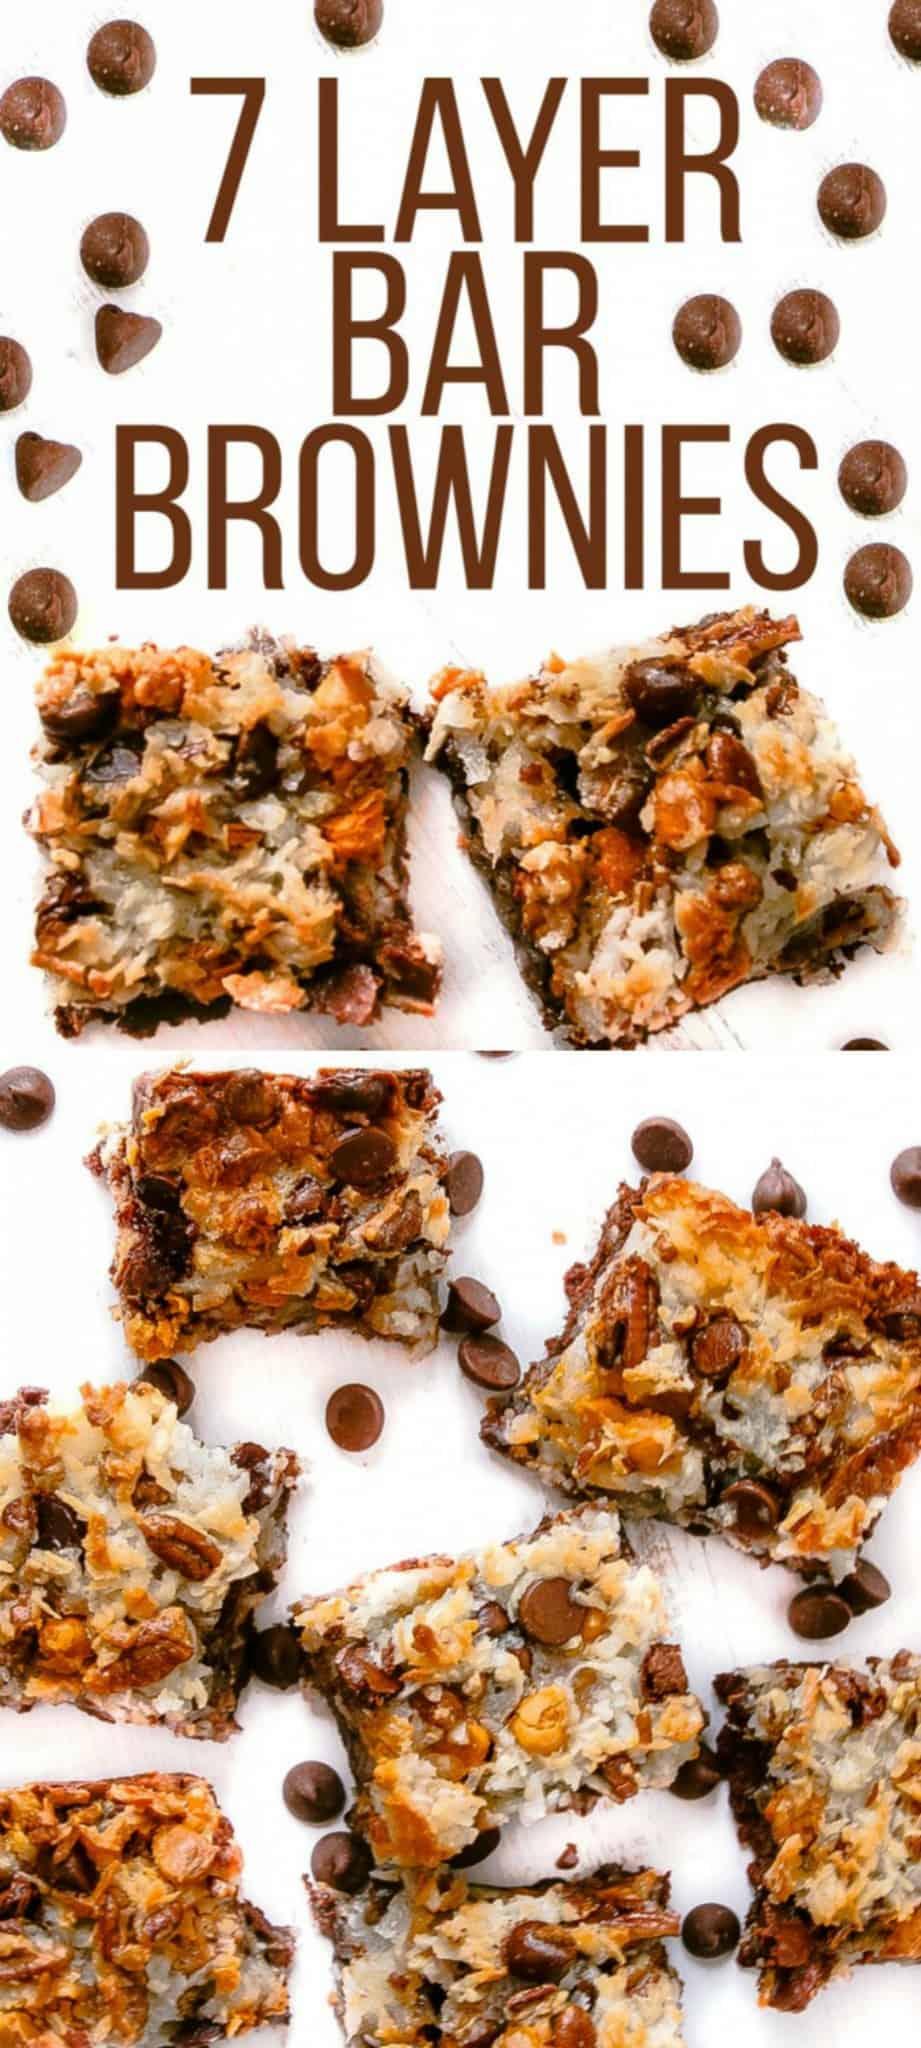 brownies-7-layer-bar